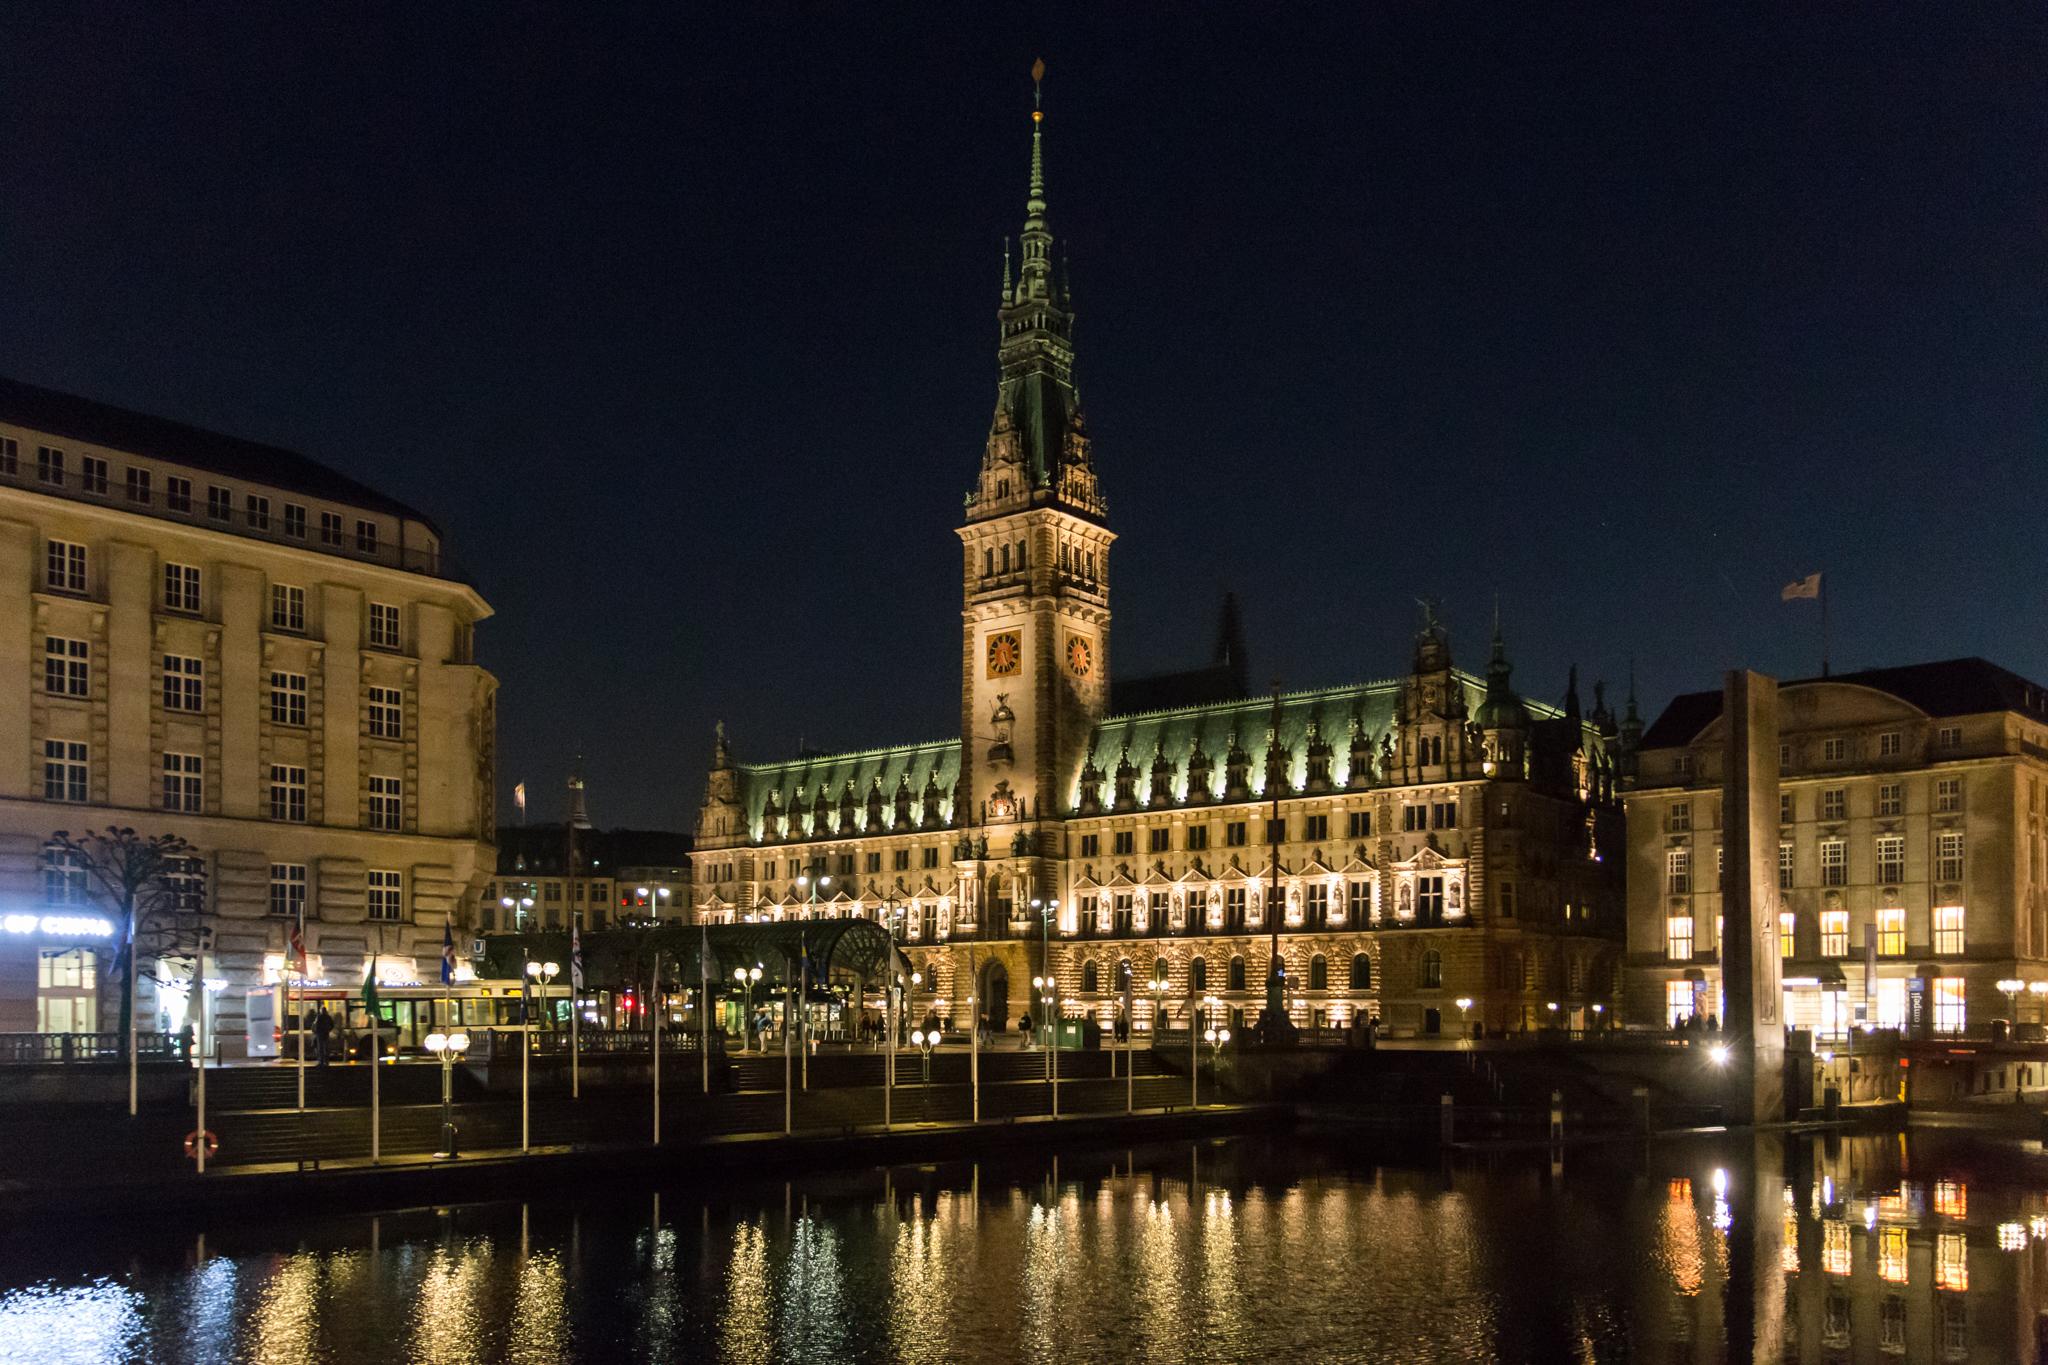 Hamburg Rathaus, Germany